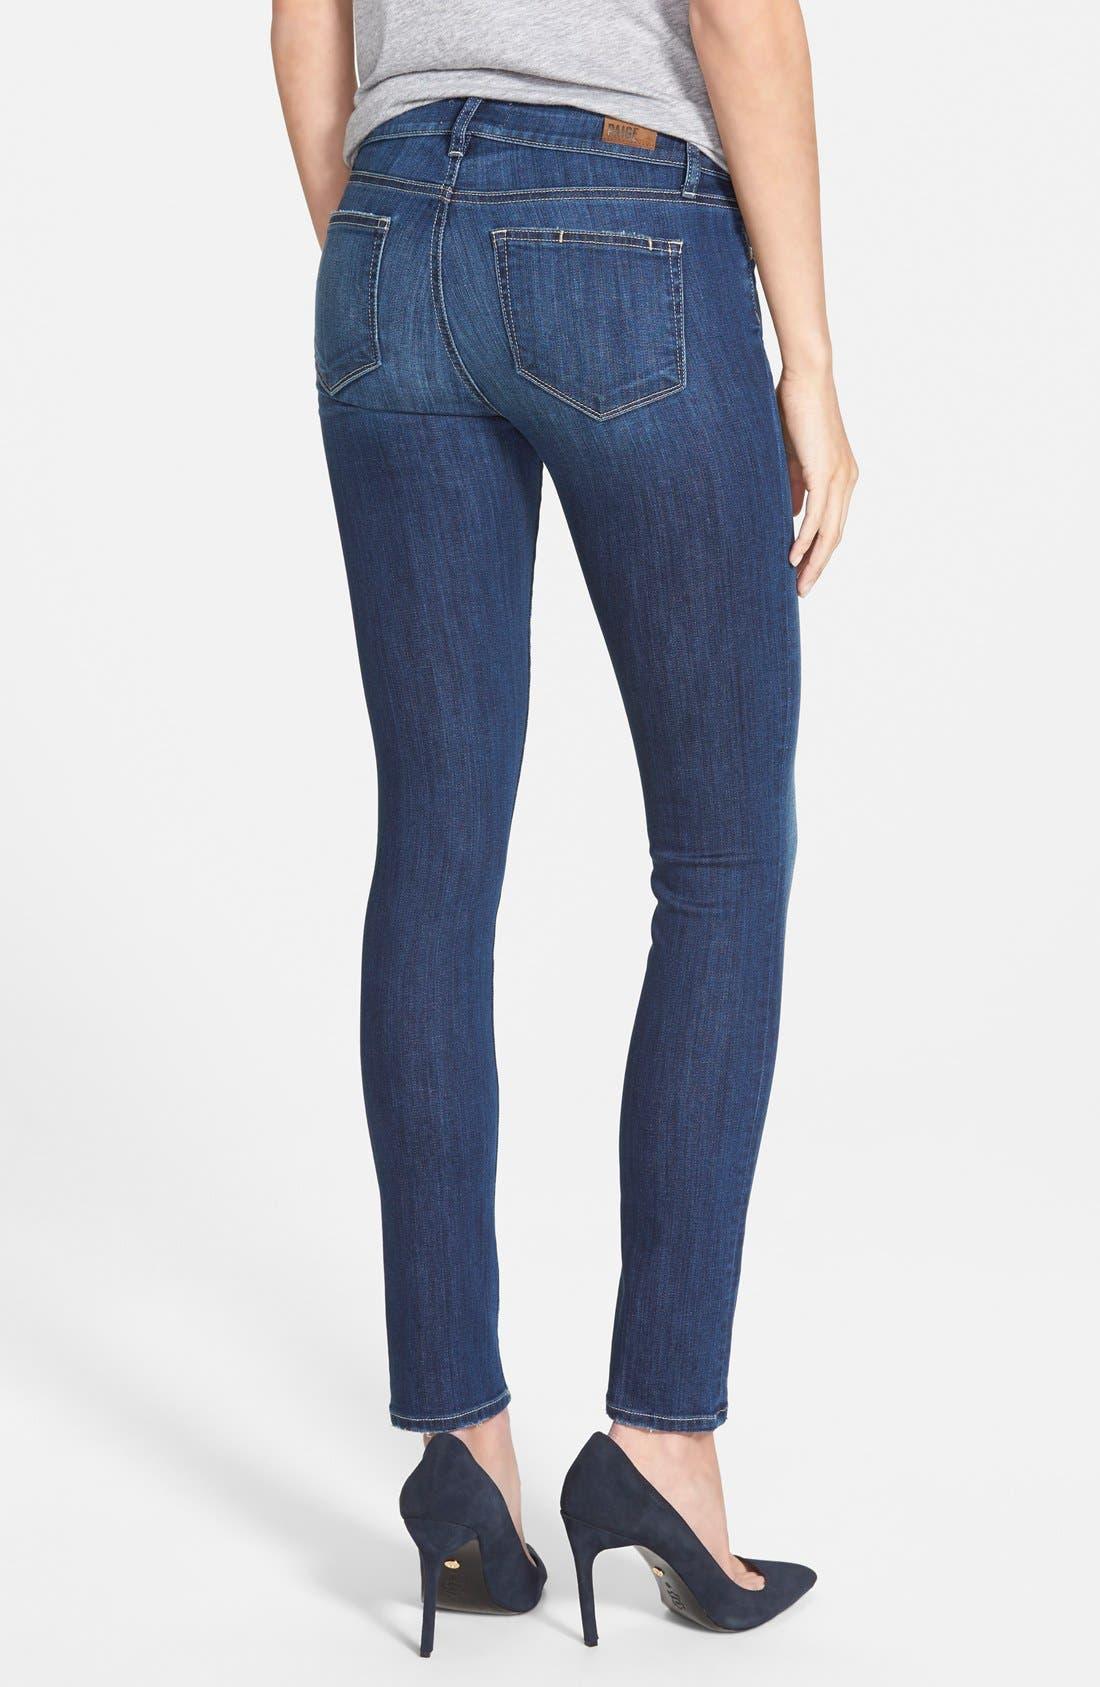 Alternate Image 3  - Paige Denim 'Skyline' Skinny Jeans (Raya) (Nordstrom Exclusive)